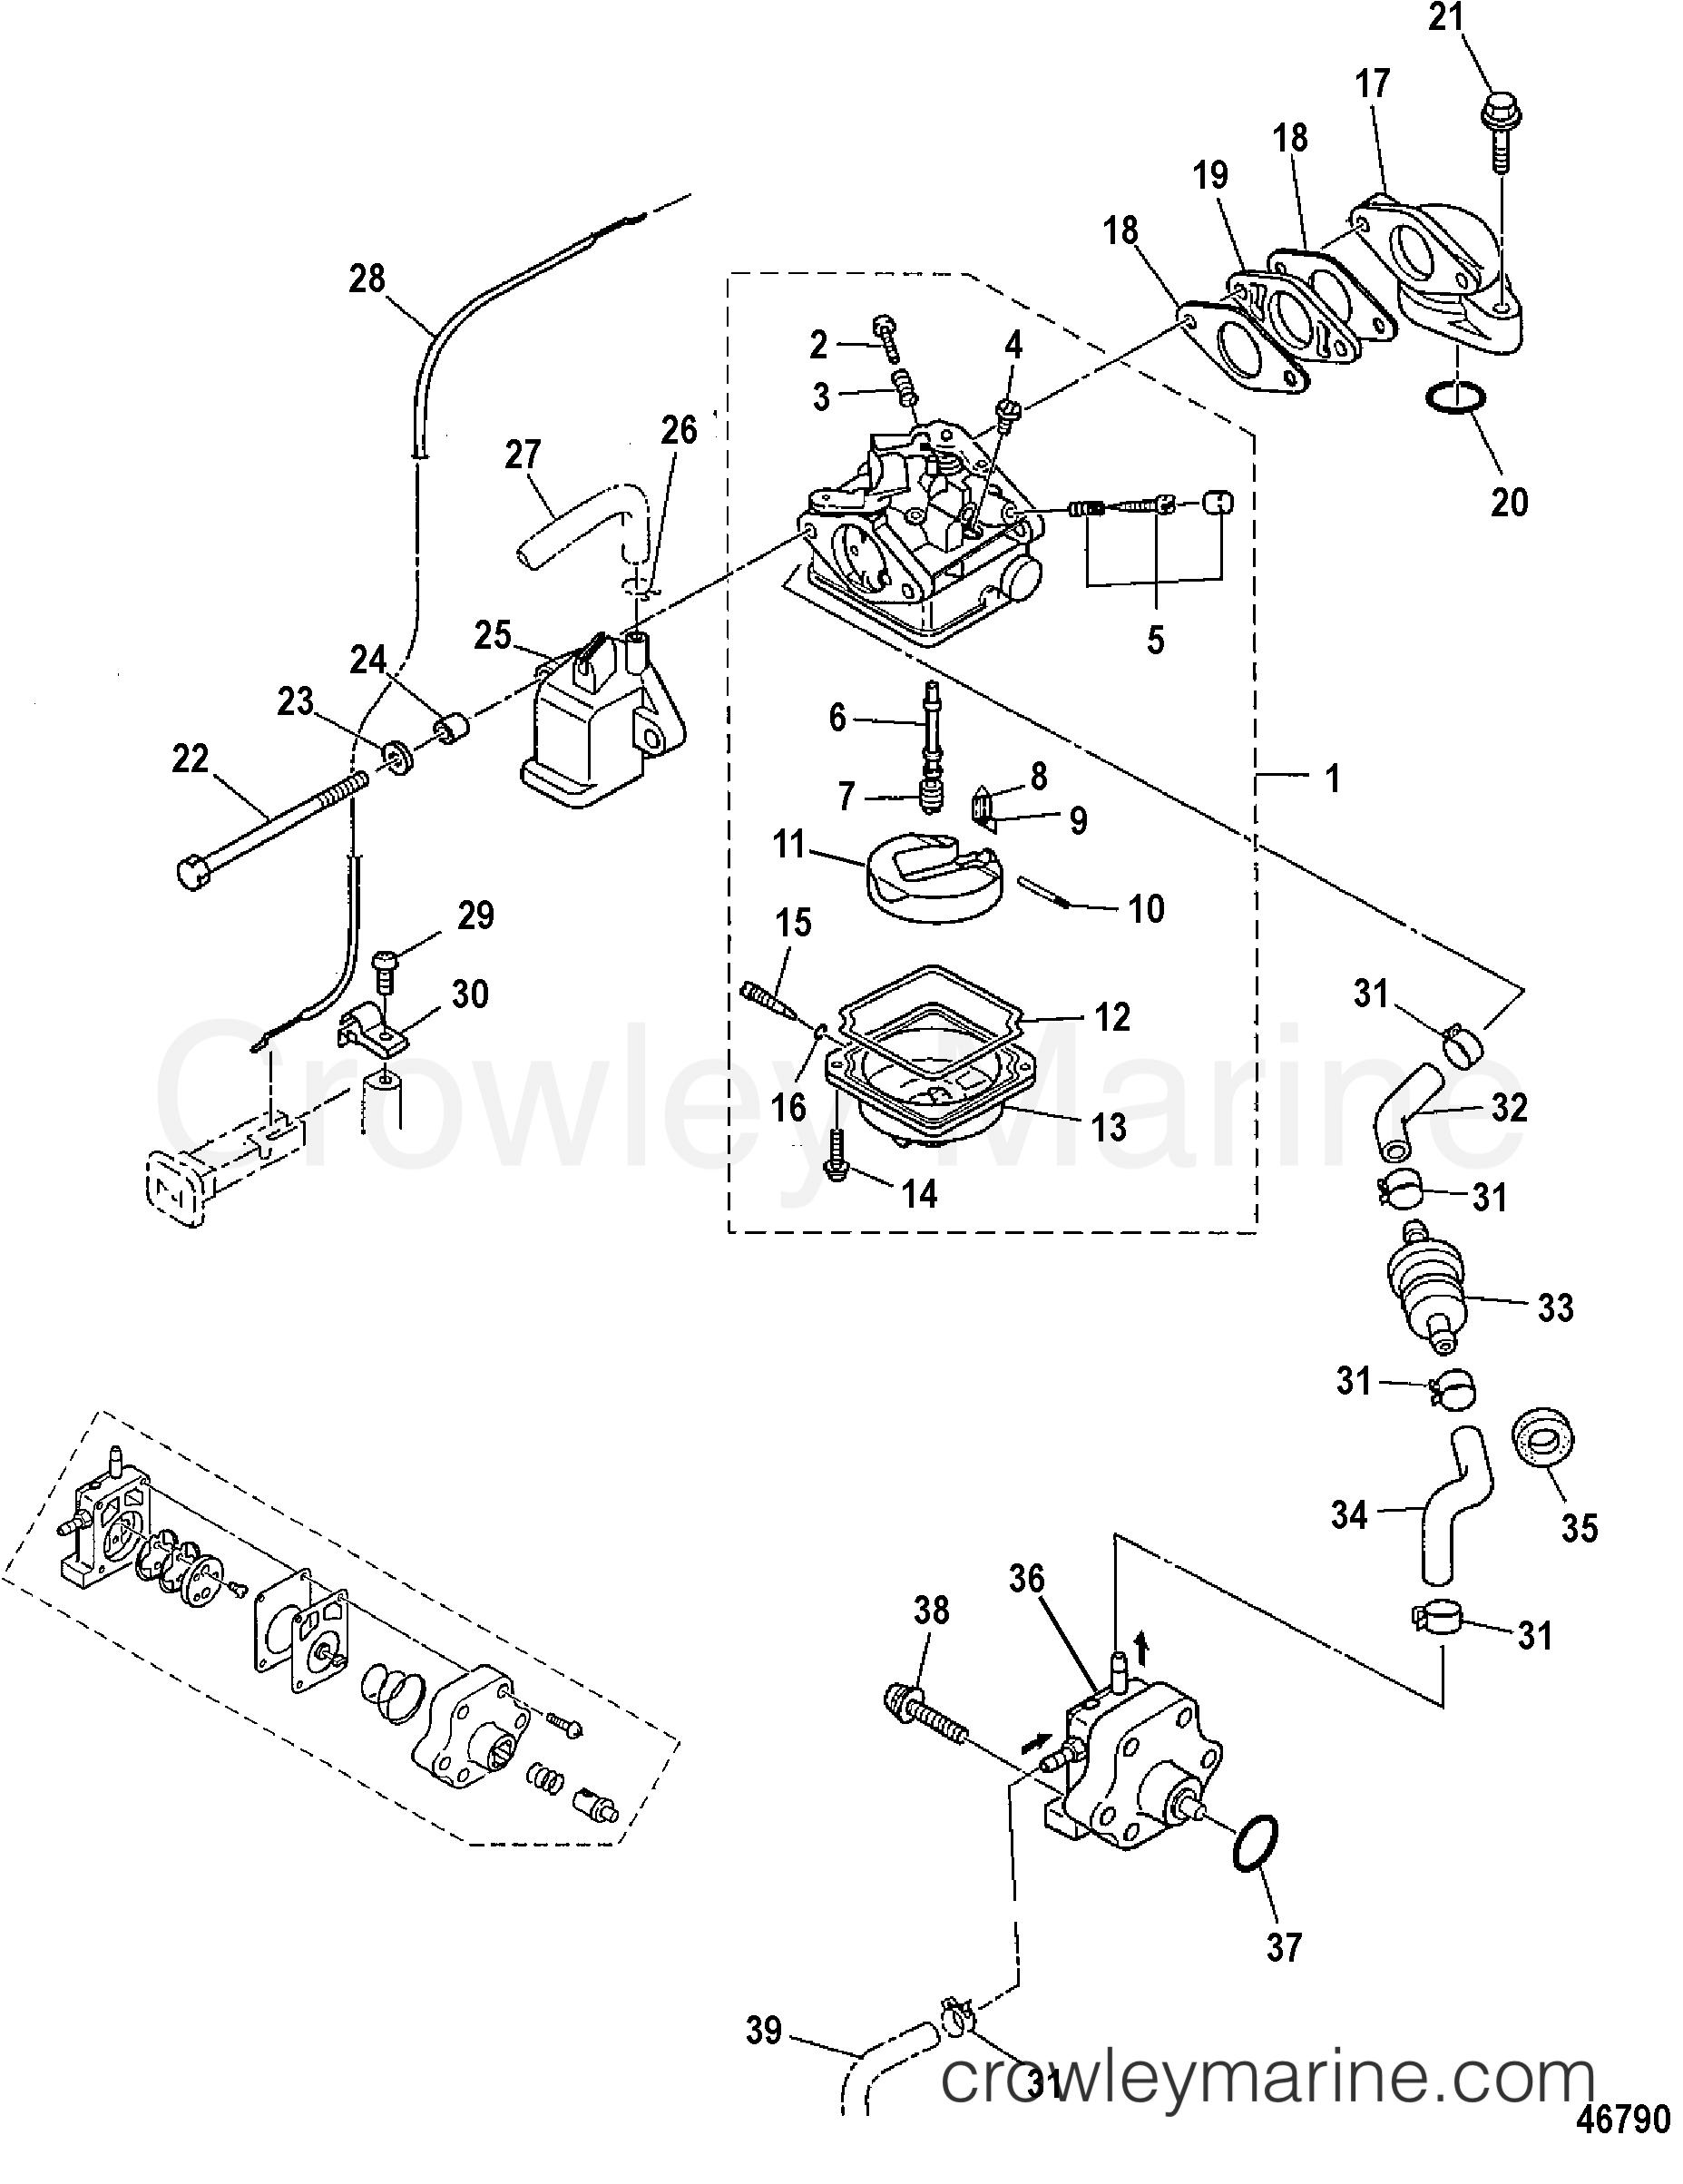 carburetor and fuel system